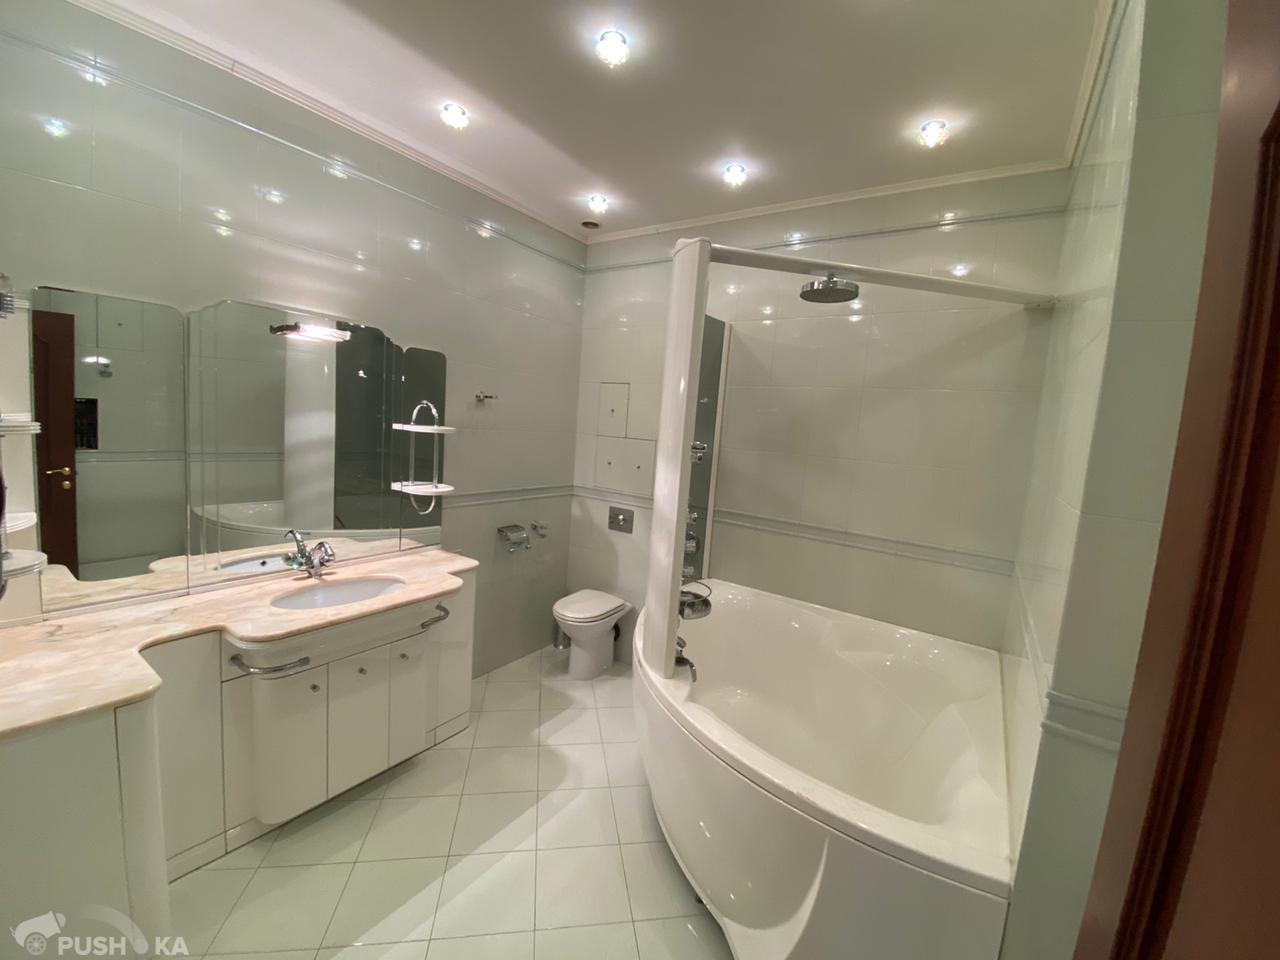 Продаётся 4-комнатная квартира 196.0 кв.м. этаж 2/22 за 69 900 000 руб